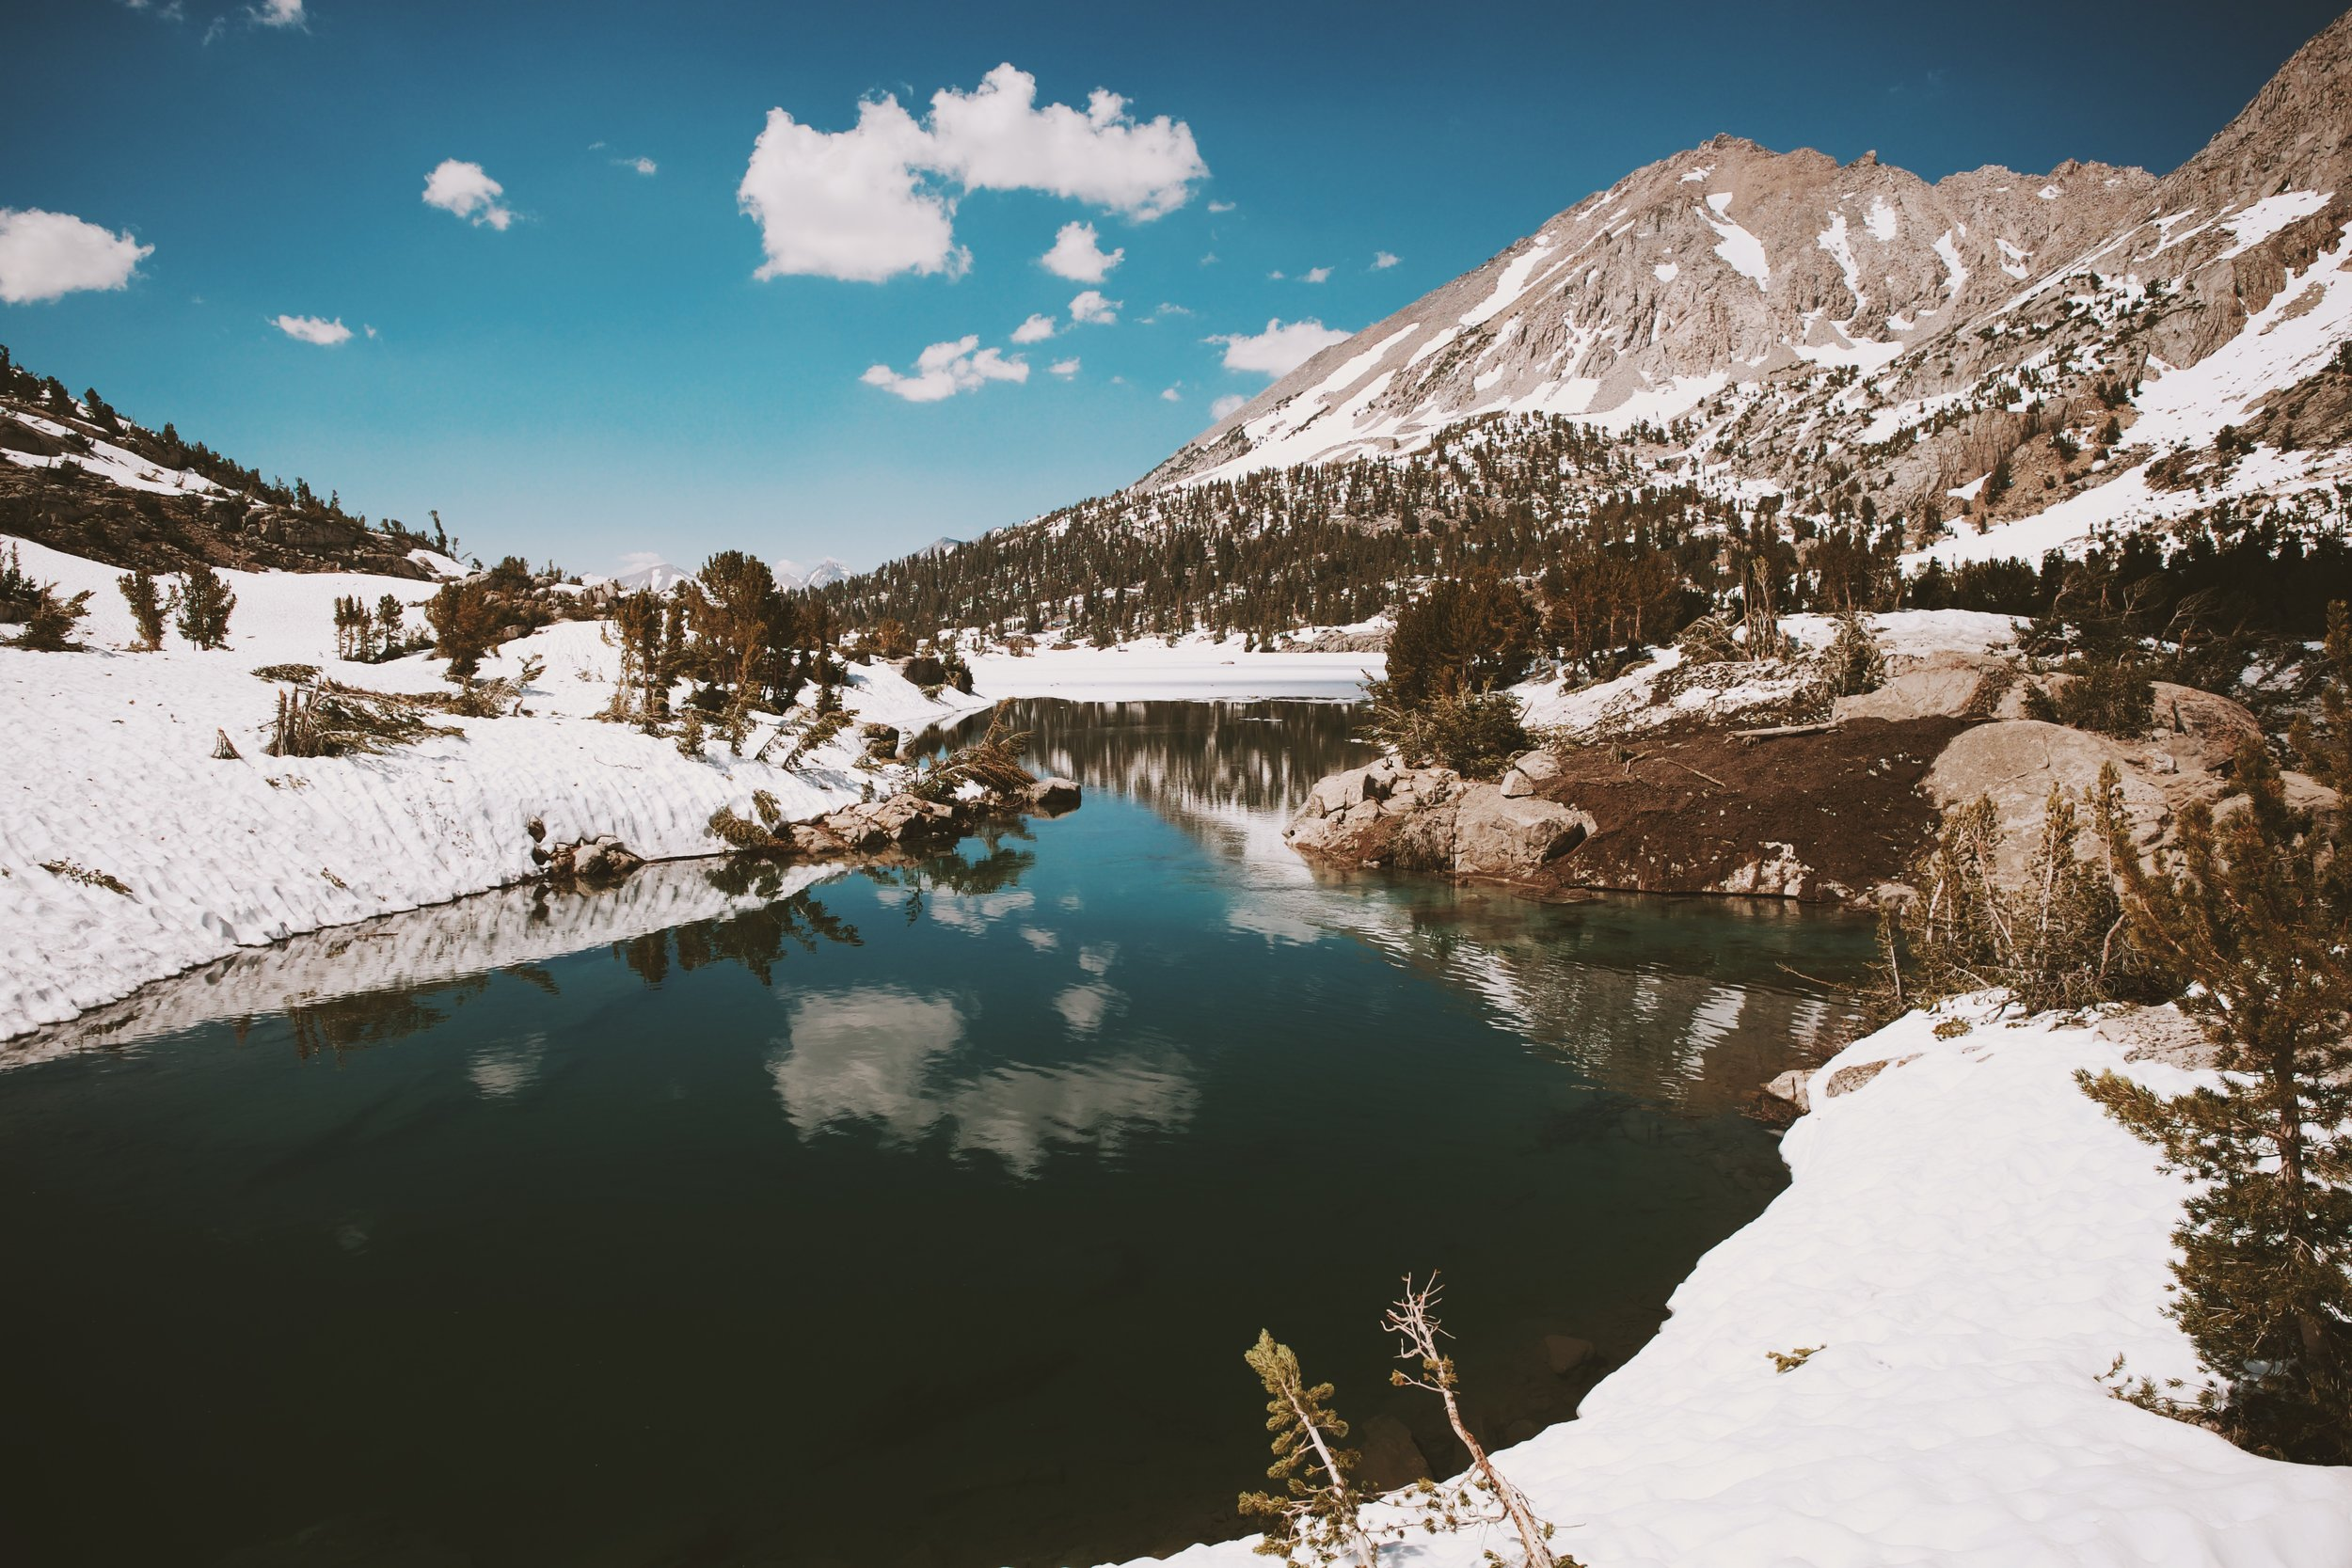 Rae lakes: beautiful but rude to walk through